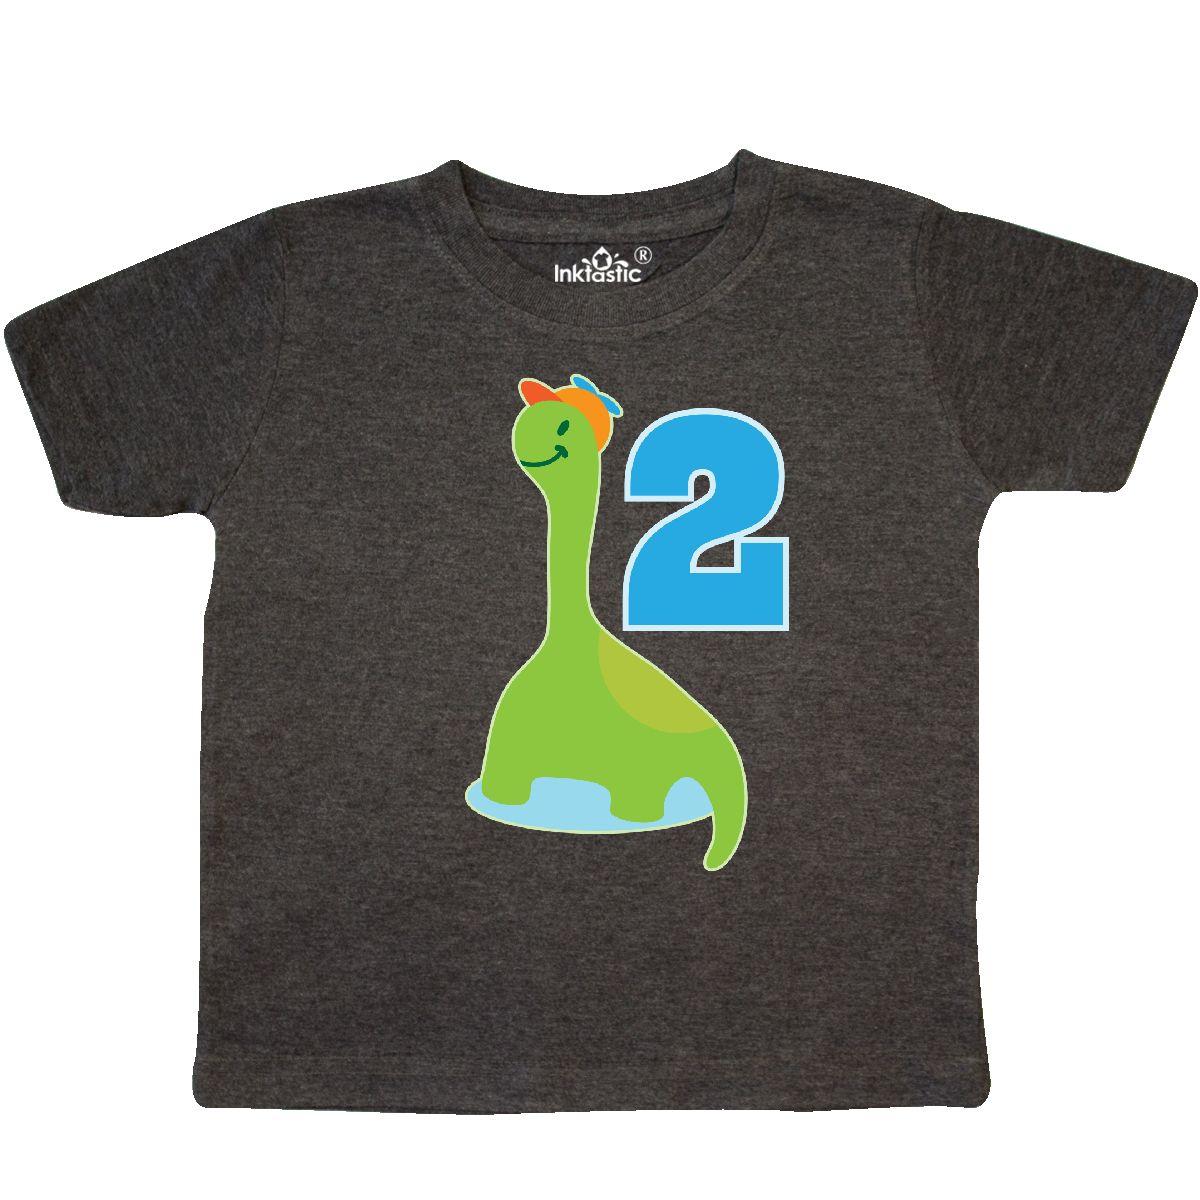 Inktastic Dinosaur 2nd Birthday Boys Cute Dino Toddler T